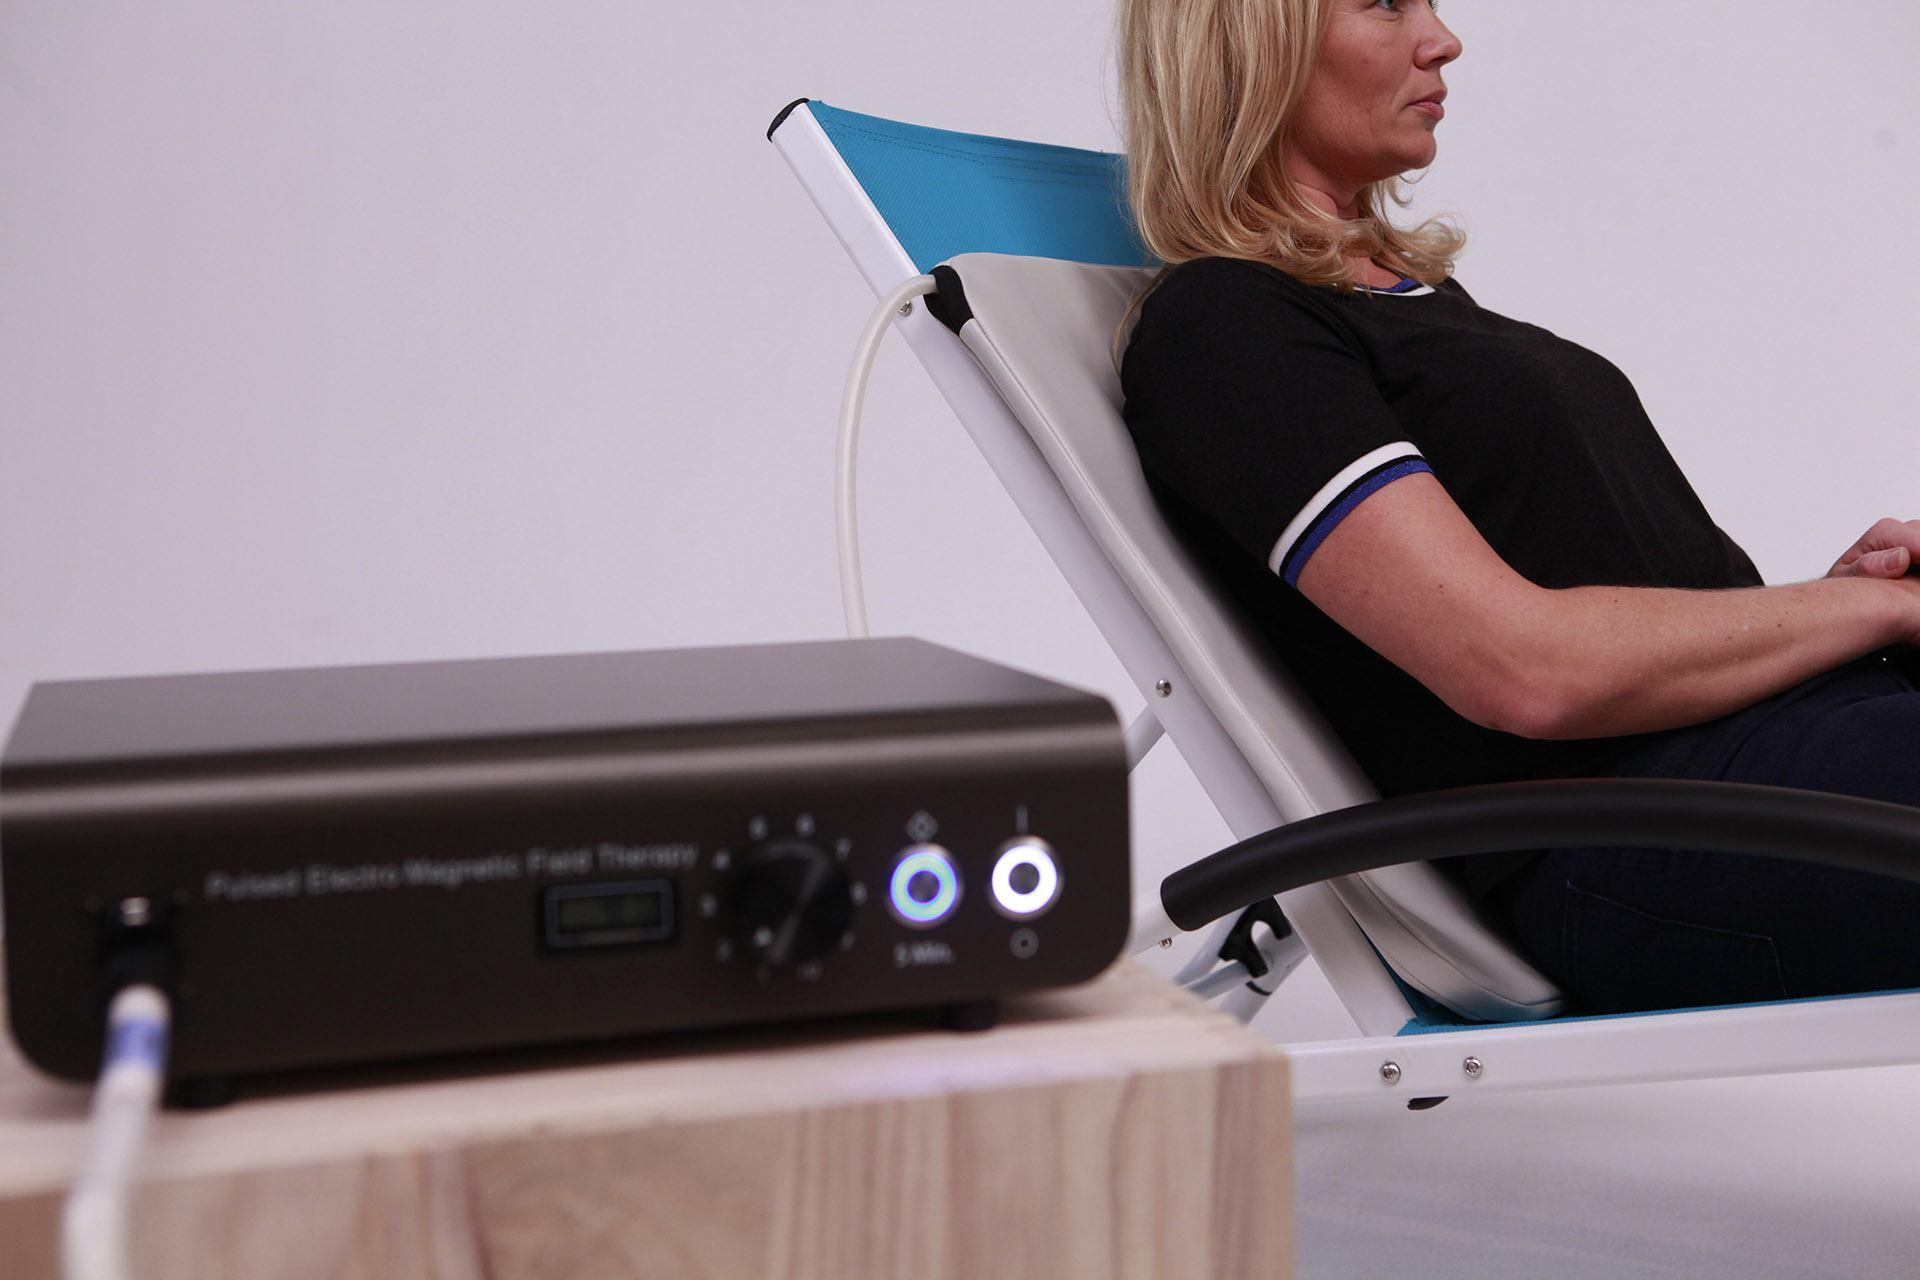 PEMF therapy machine TeslaFit Pro 2 LowBack chiropractic